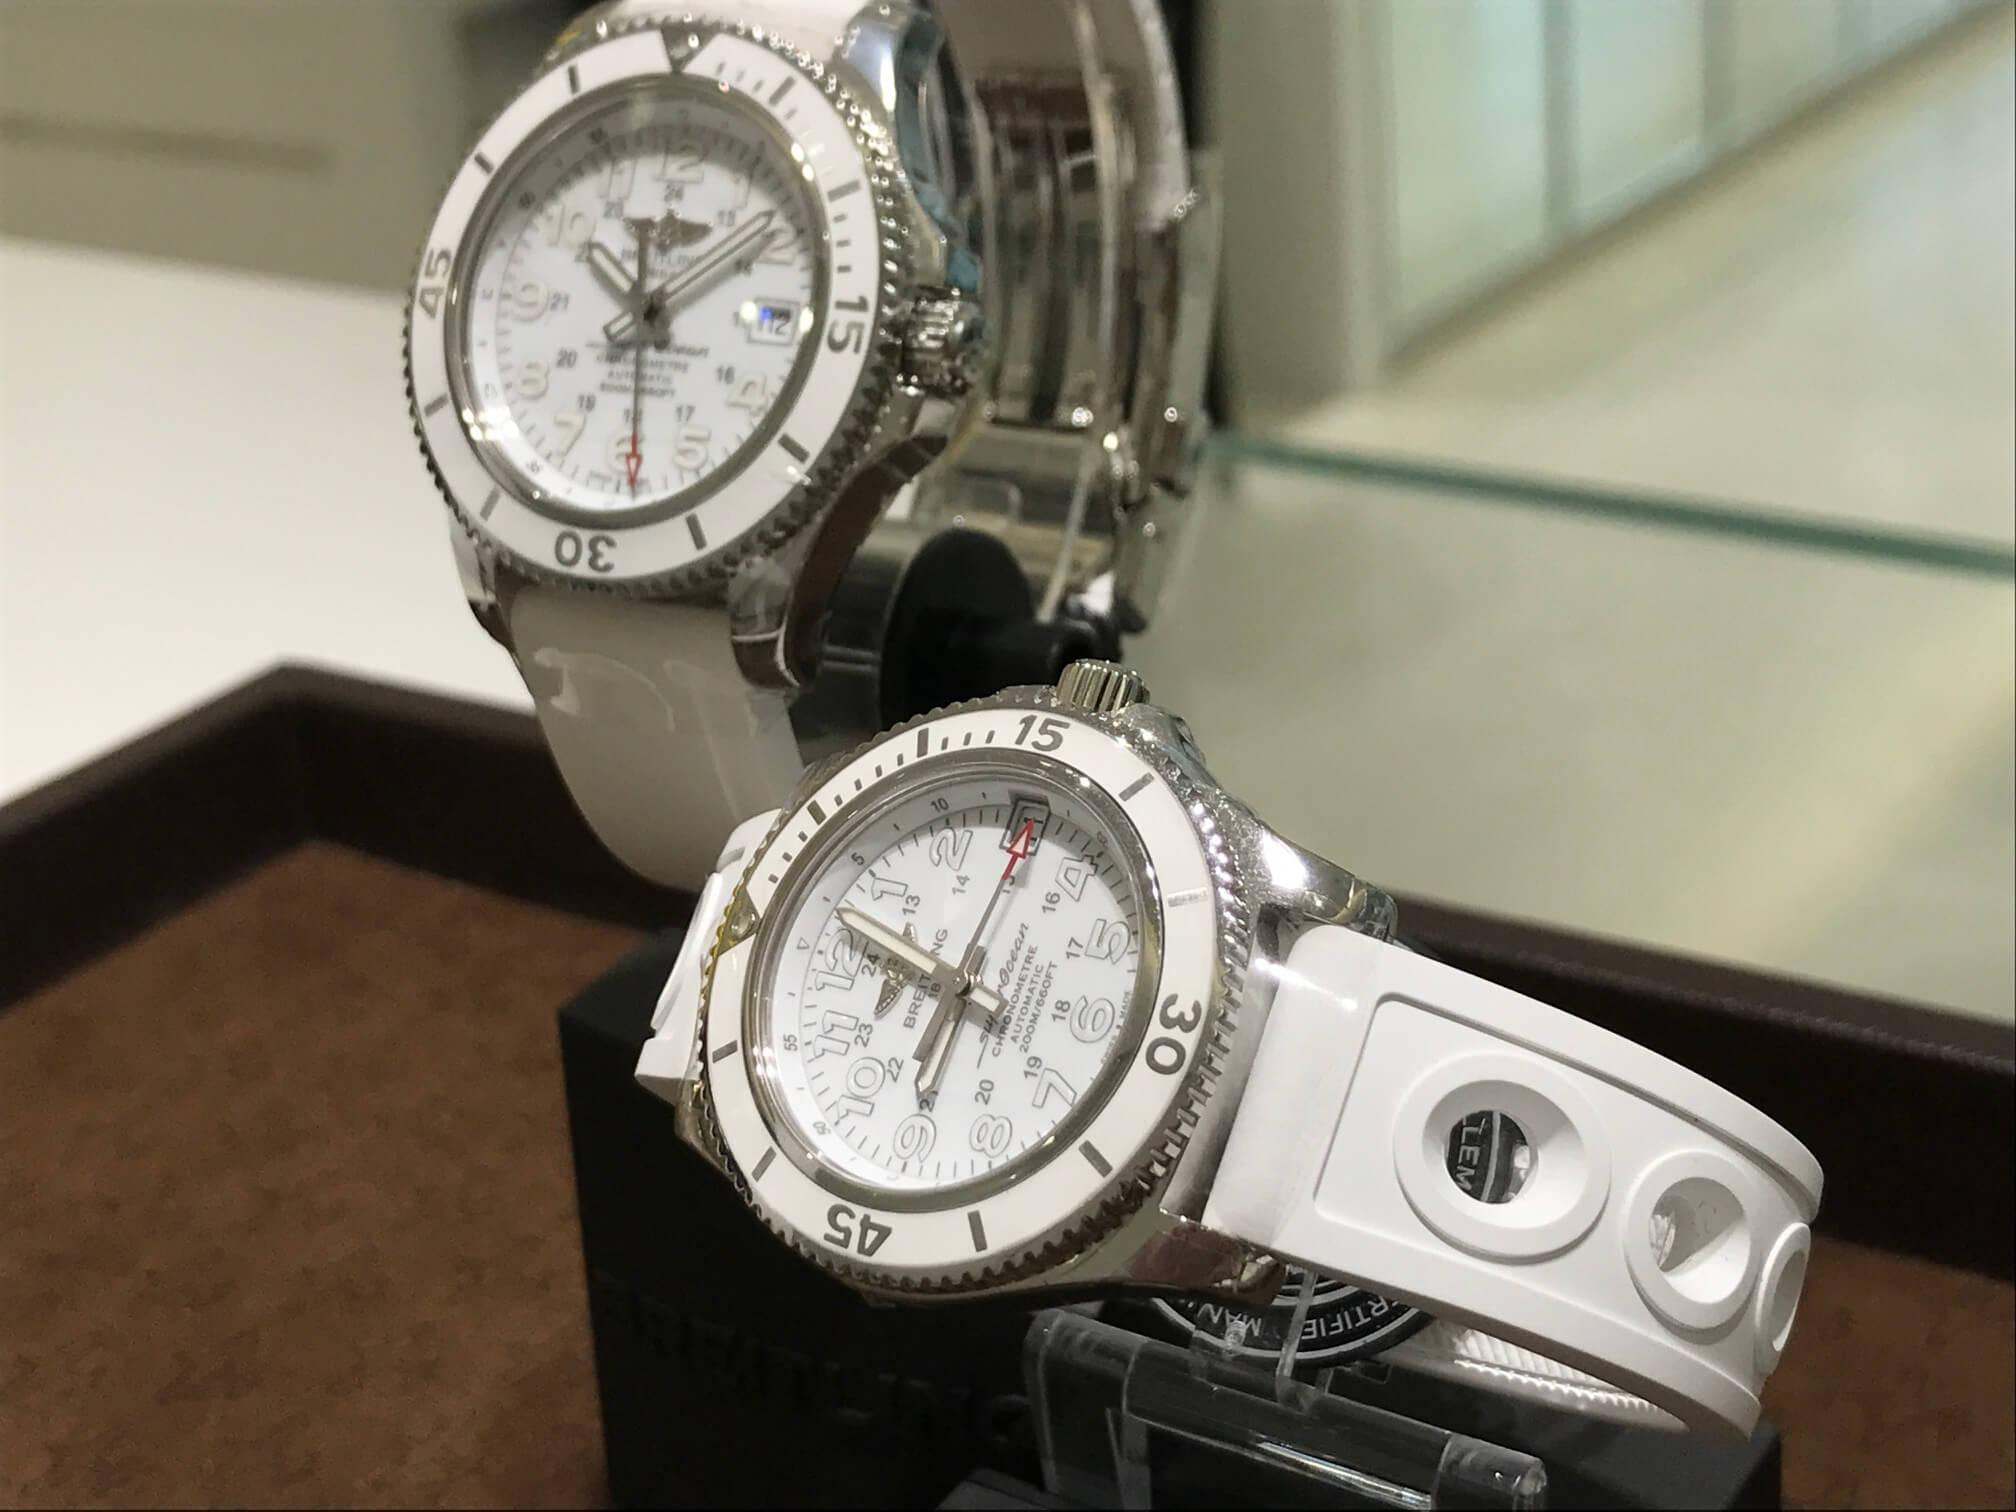 differently e1d4c e0789 ペアーでどうですか☺ | 精光堂 -SEIKODO- 輸入時計正規販売・高 ...